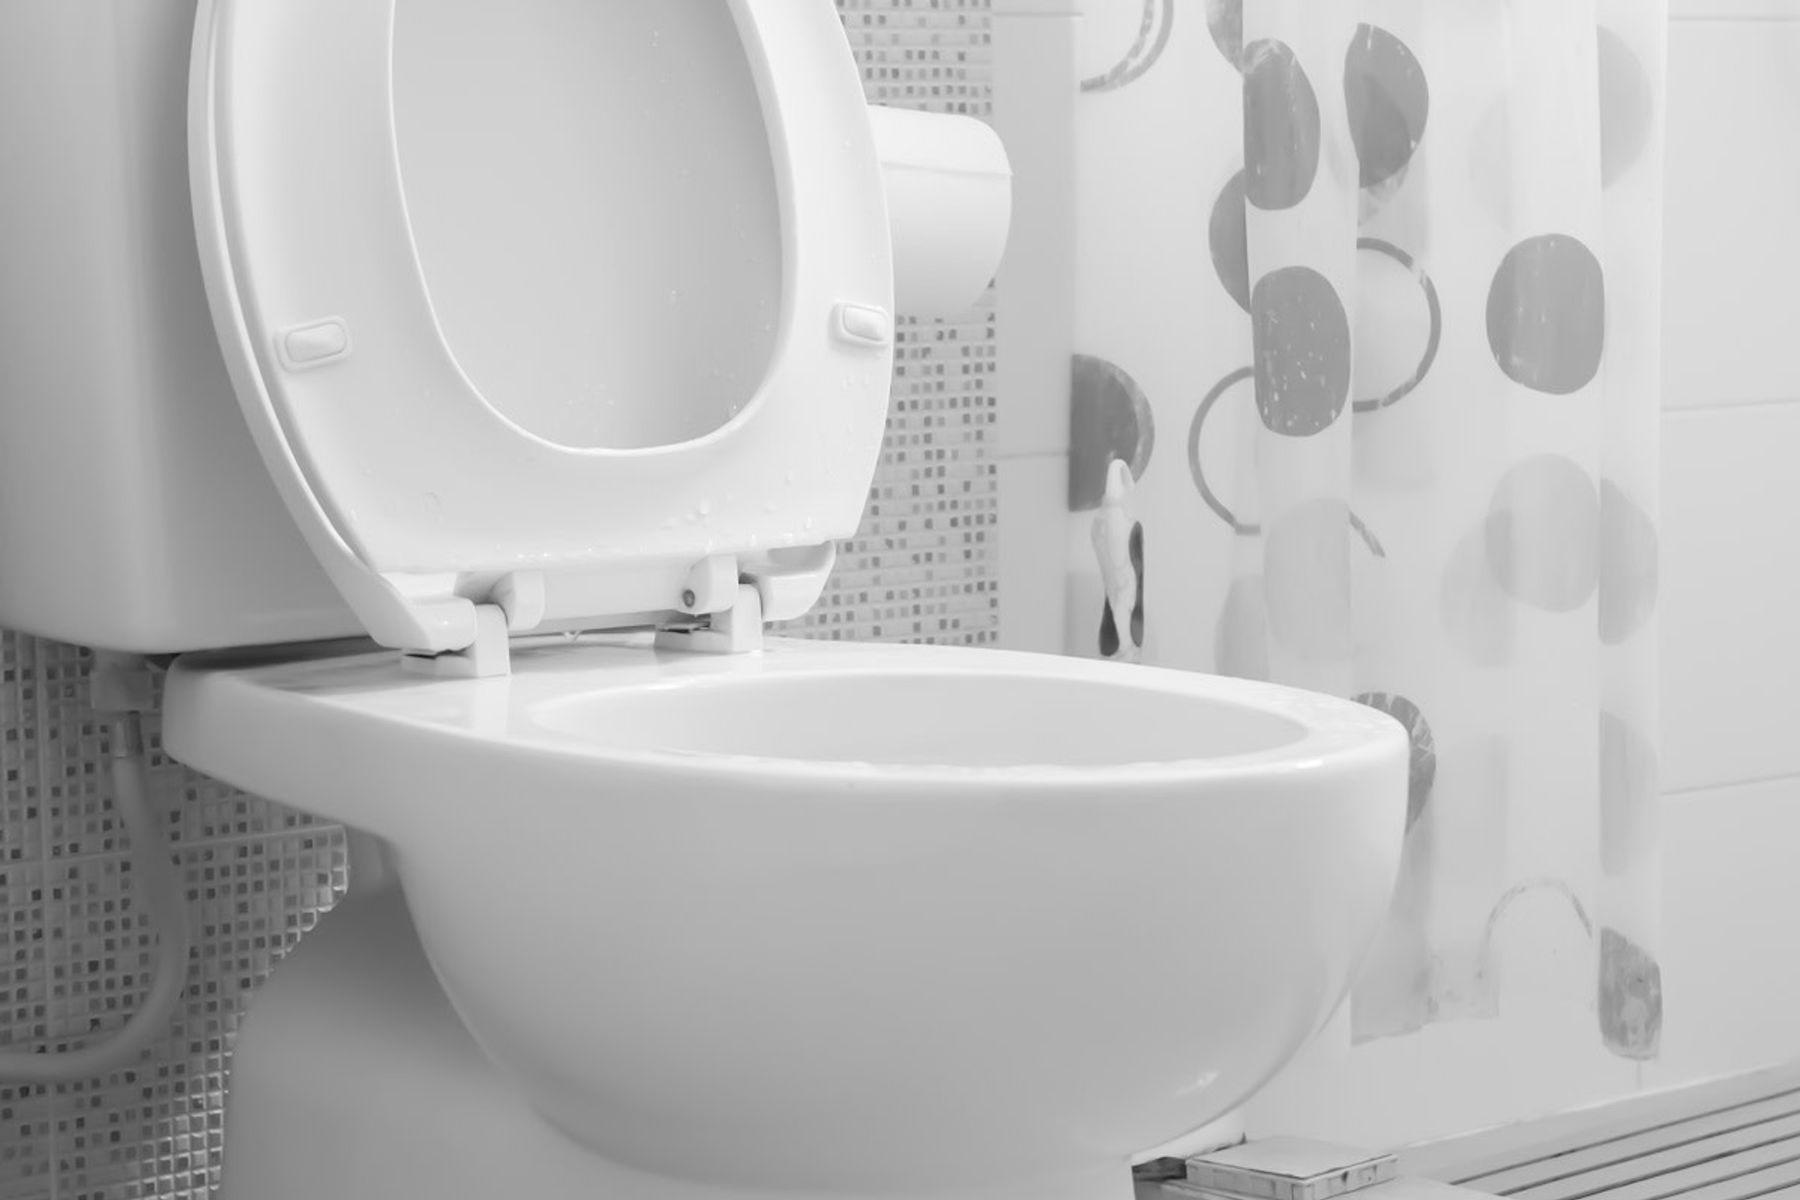 Tuvalet ve klozet